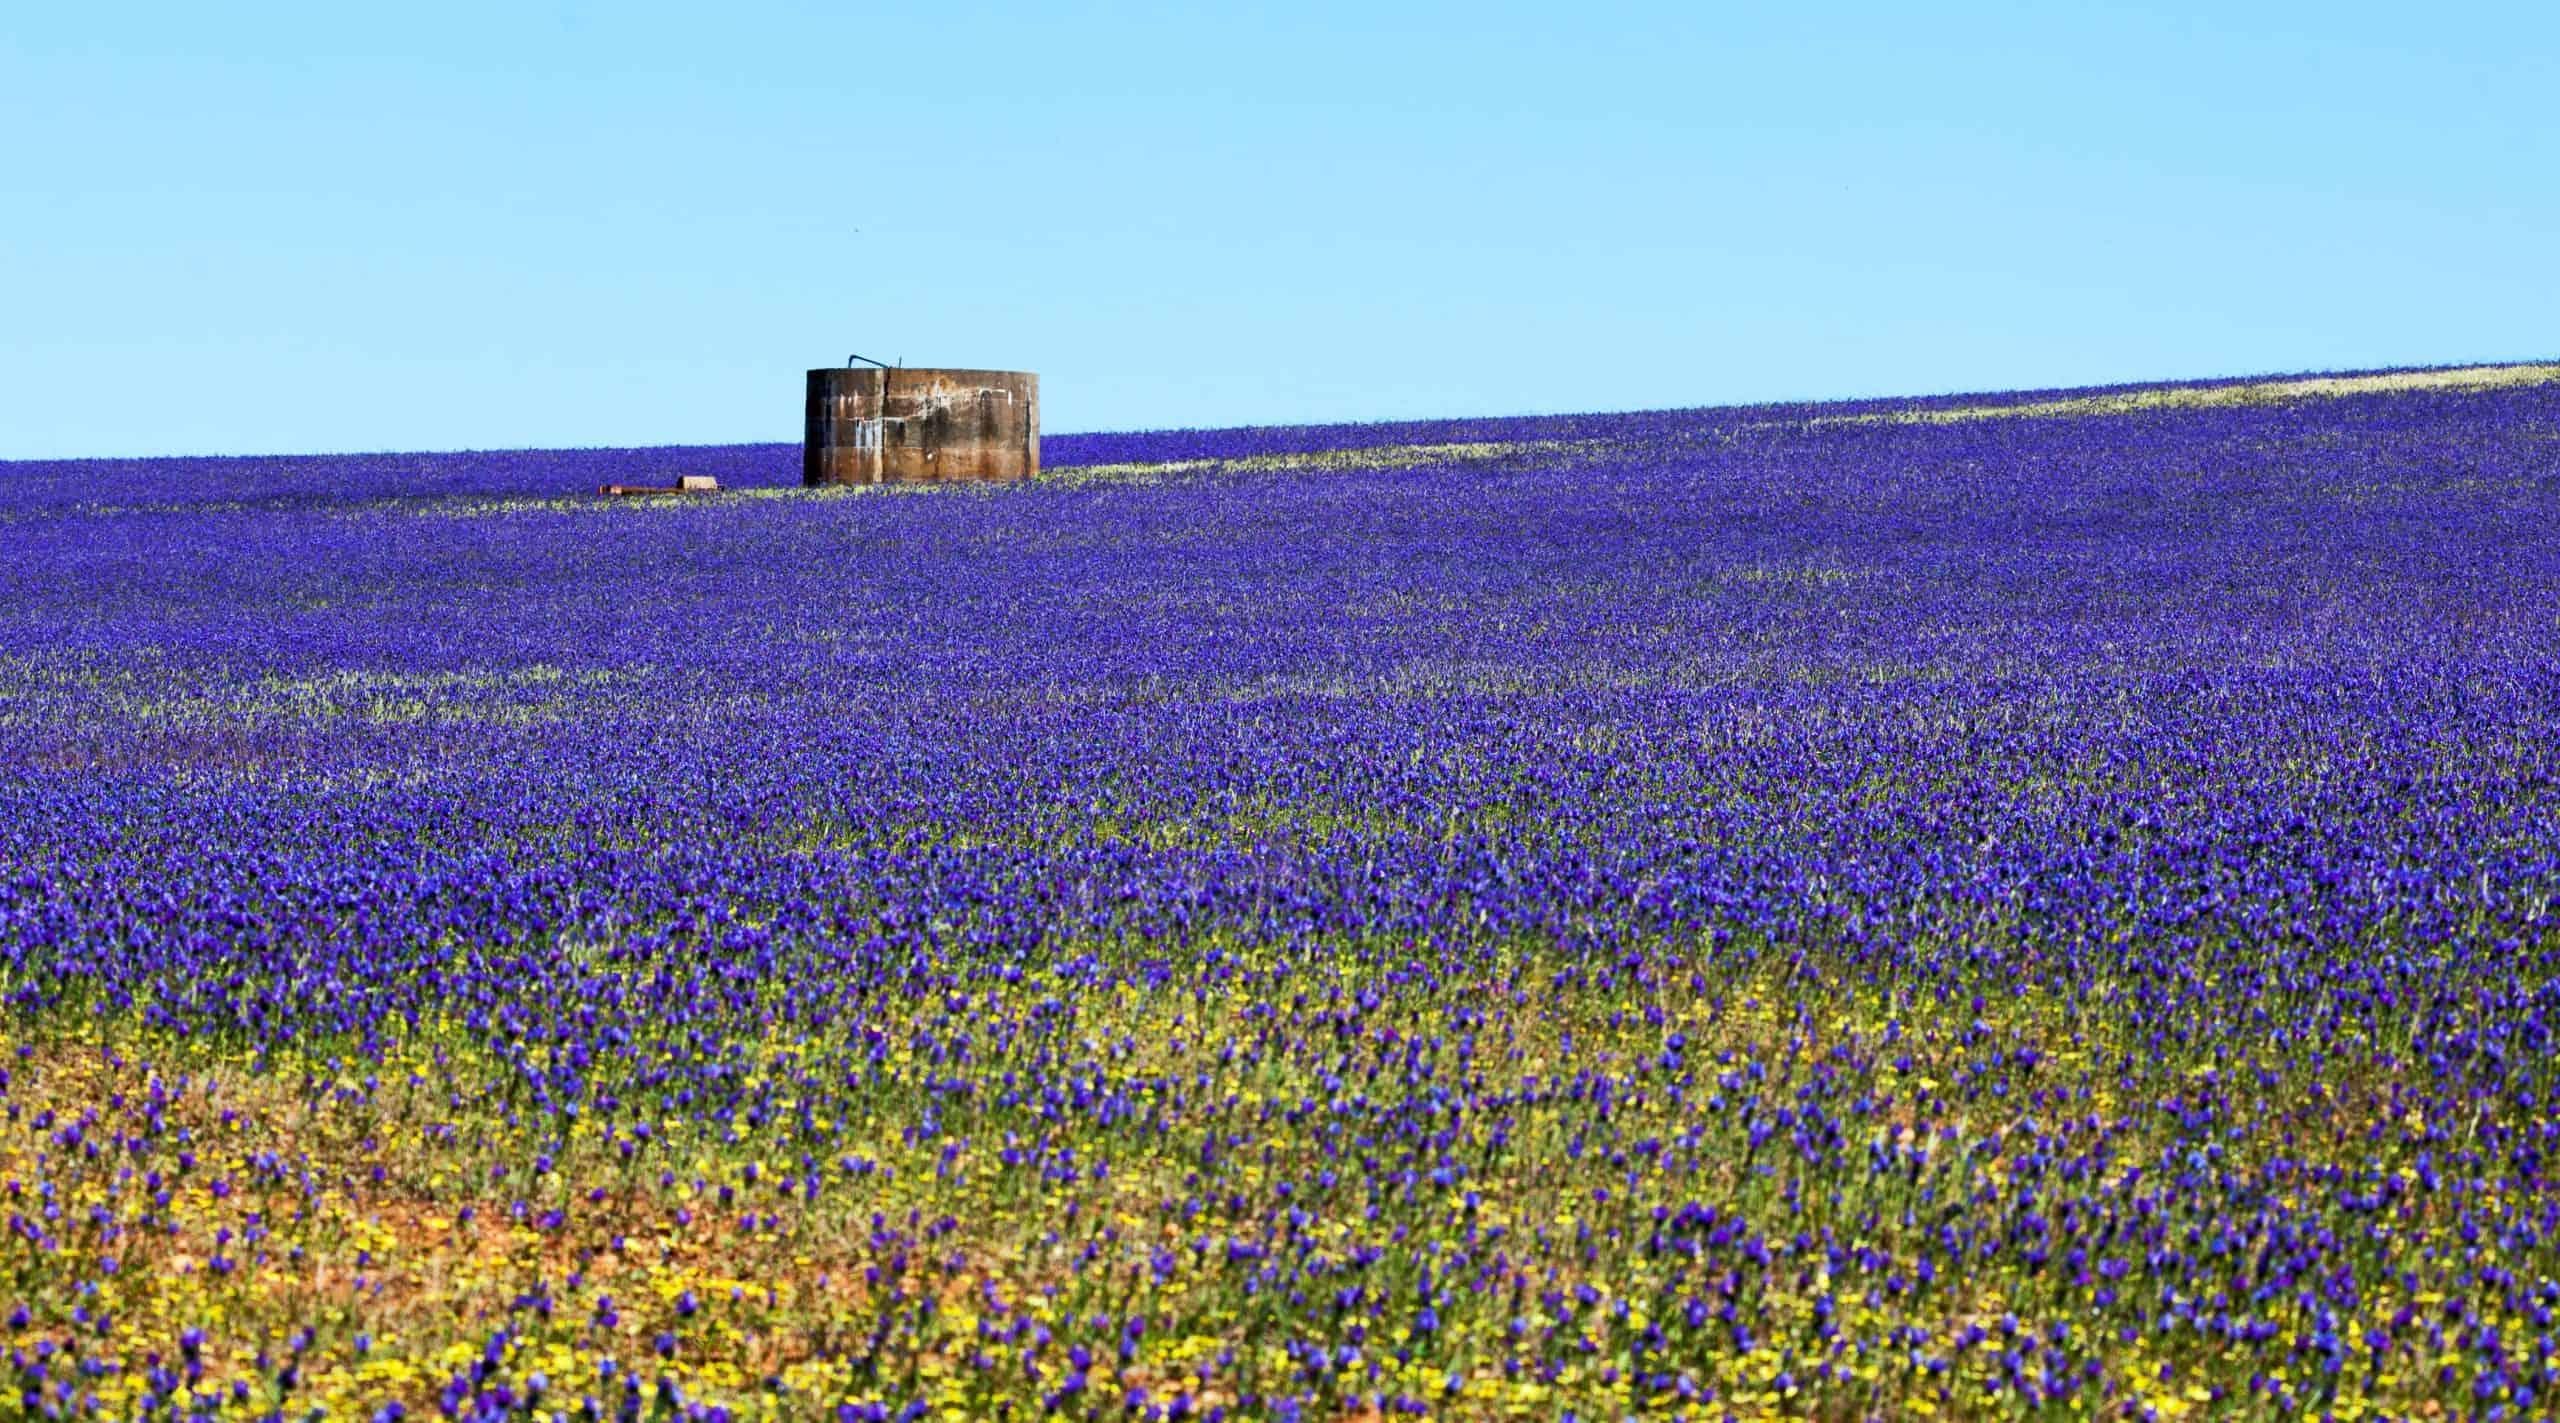 Blue Lechenaultia Wildflowers in Geraldton, Western Australia